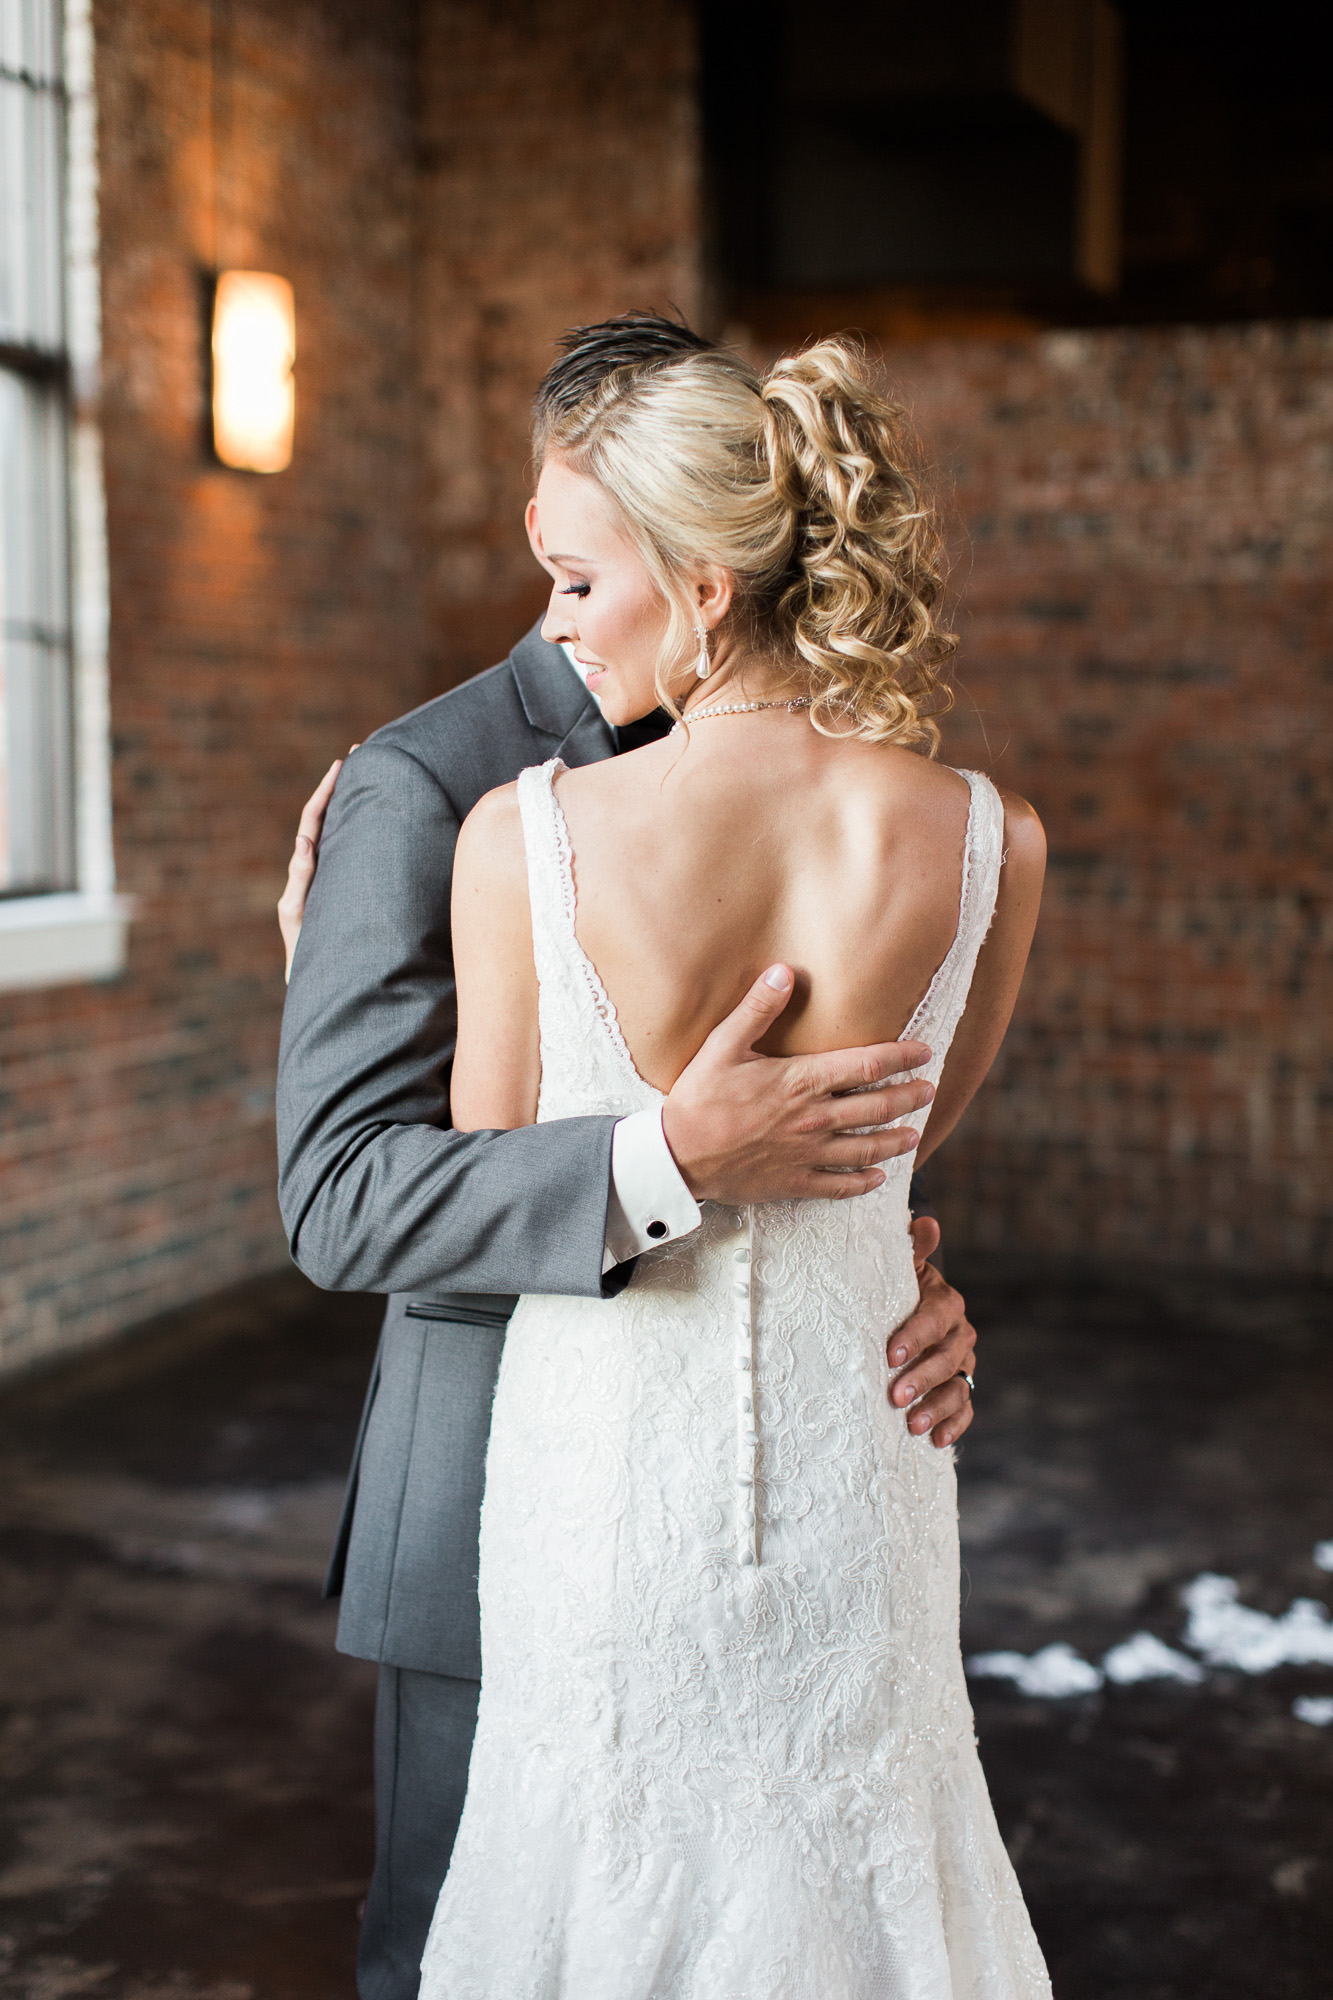 f24cb-downtown-bryan-weddingdowntown-bryan-wedding.jpg